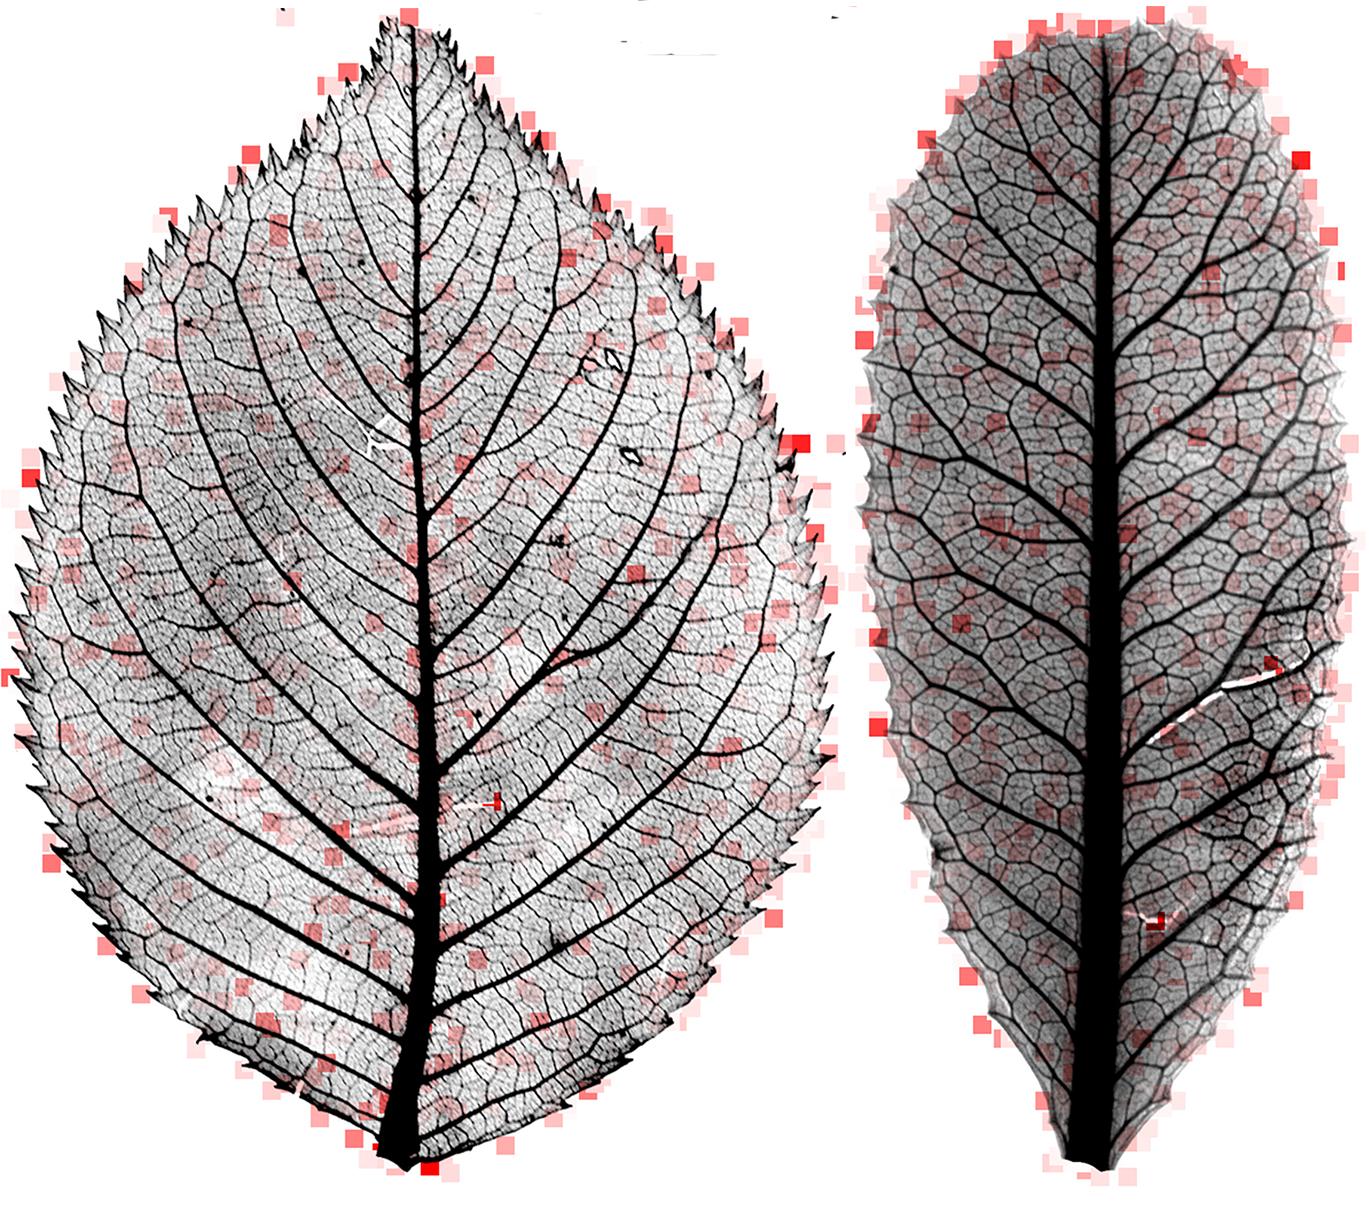 leaf mysteries revealed through the computer 39 s eye. Black Bedroom Furniture Sets. Home Design Ideas